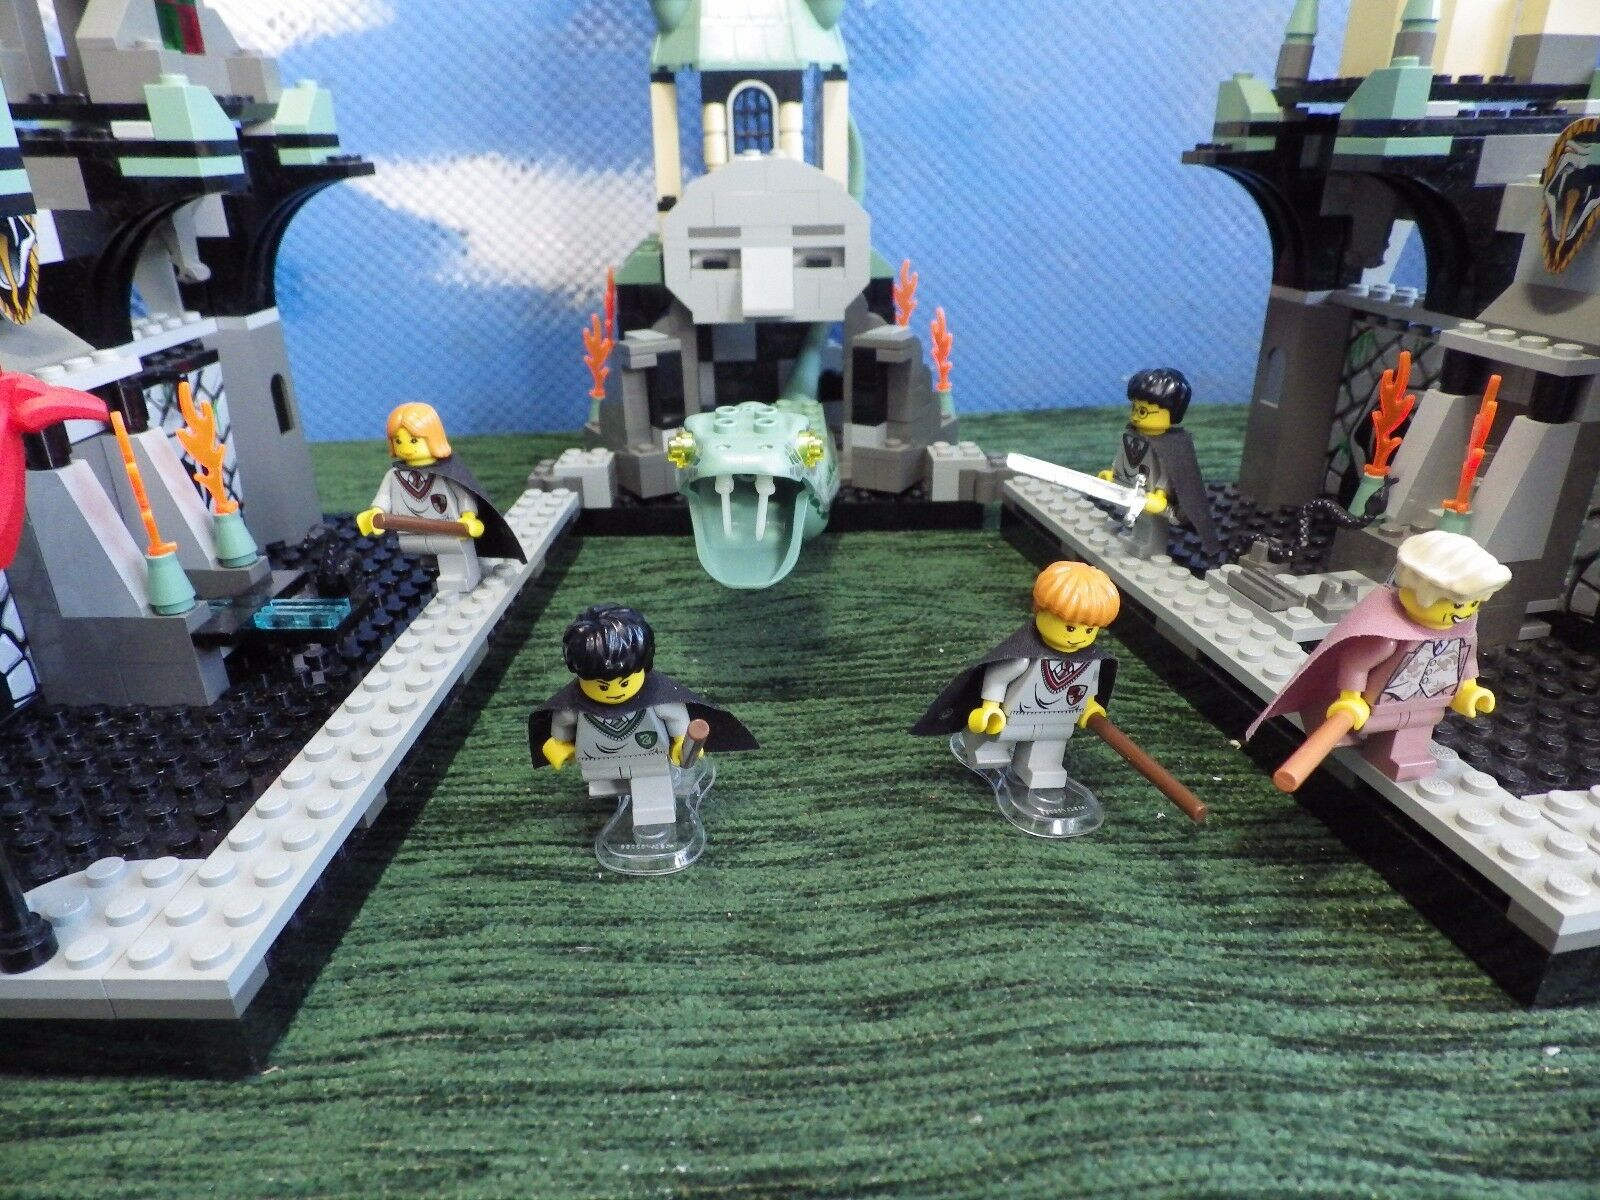 BRAND NEW SEALED BOX LEGO HARRY POTTER SET 4730 THE CHAMBER OF SECRETS